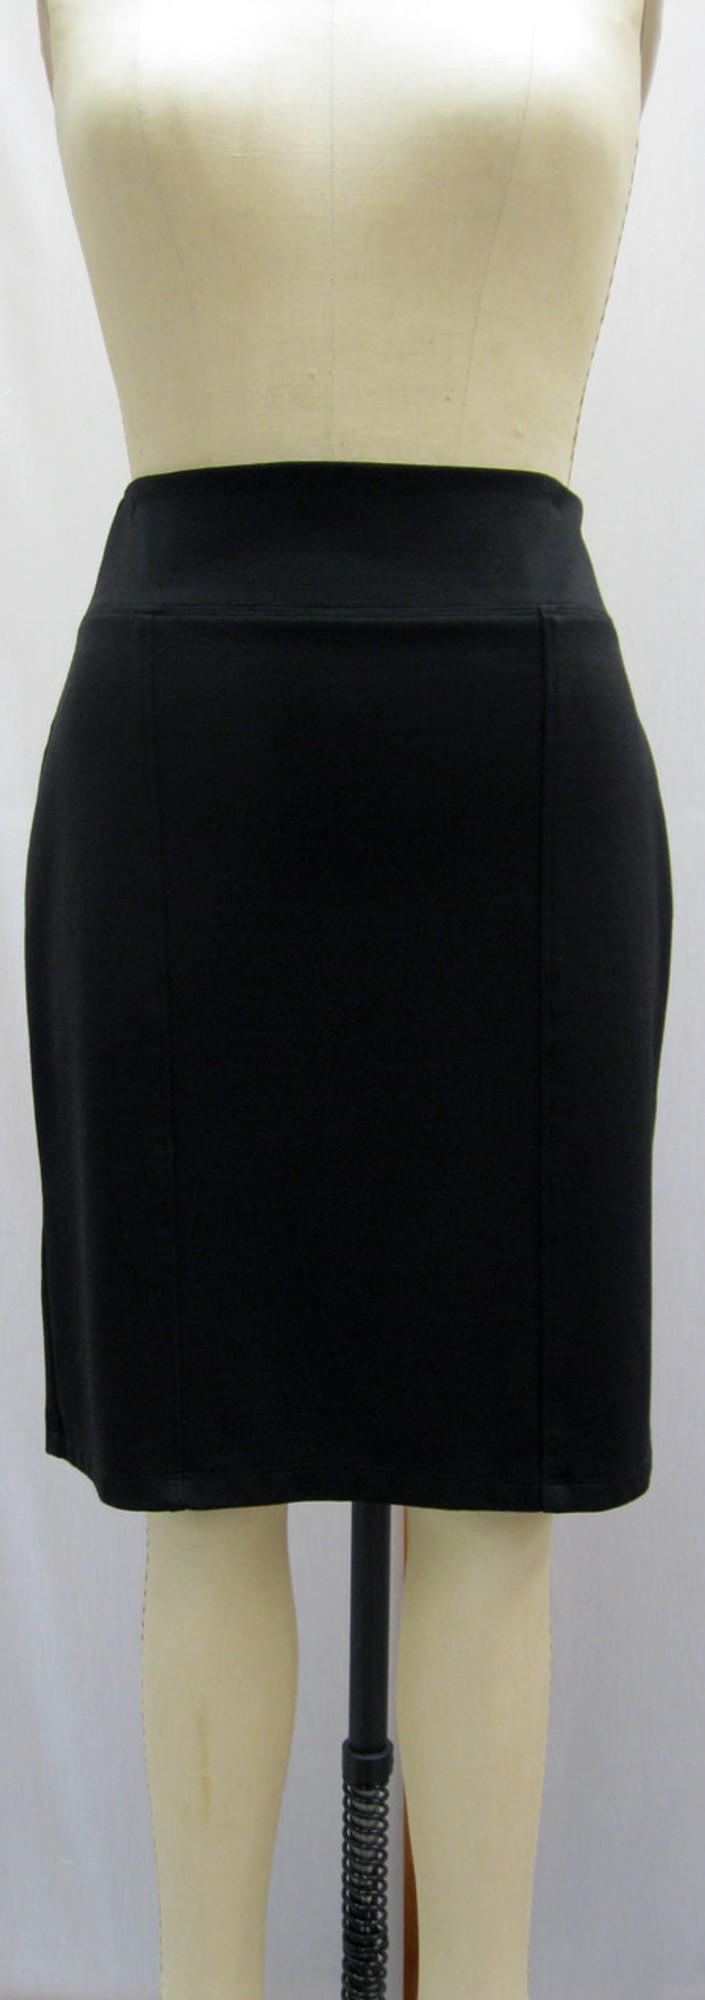 Ponte Knit Straight 6-Panel Skirt, Front, Black